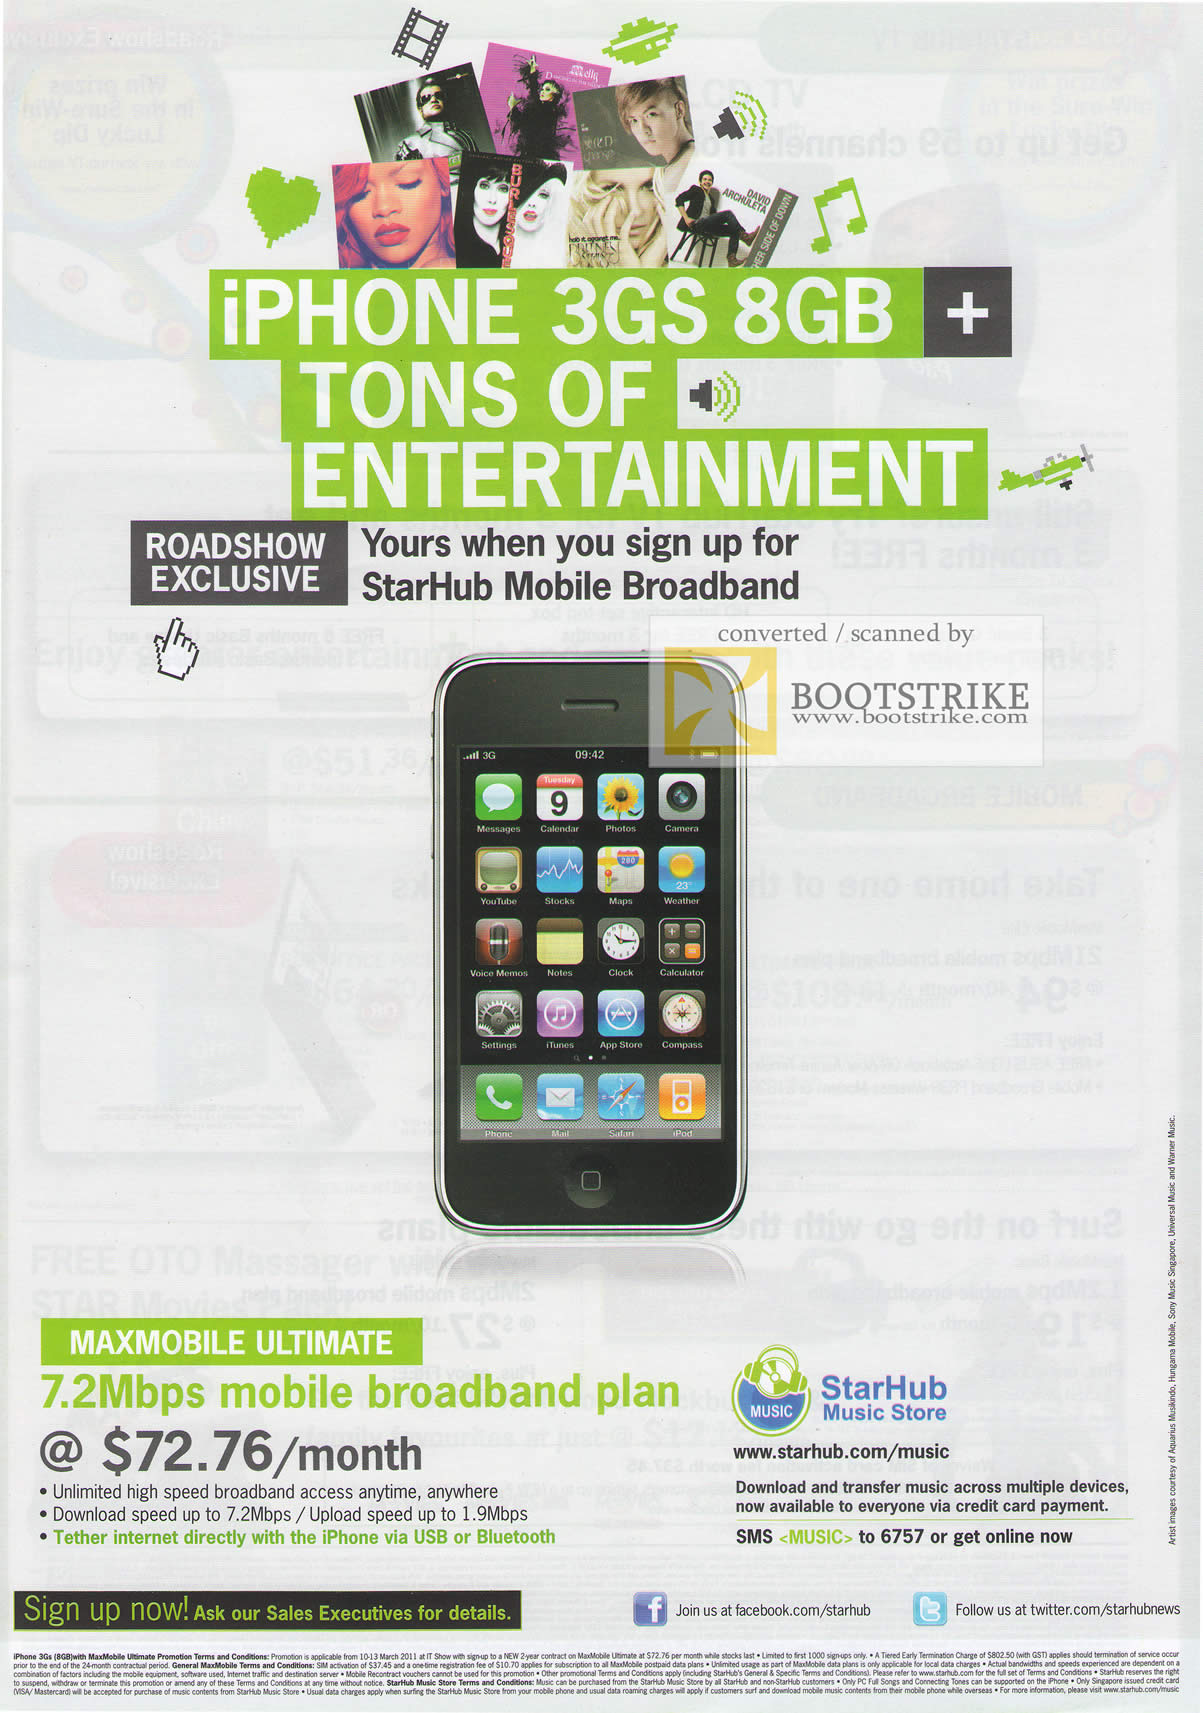 IT Show 2011 price list image brochure of Starhub Maxmobile Ultimate Iphone 3GS 8GB